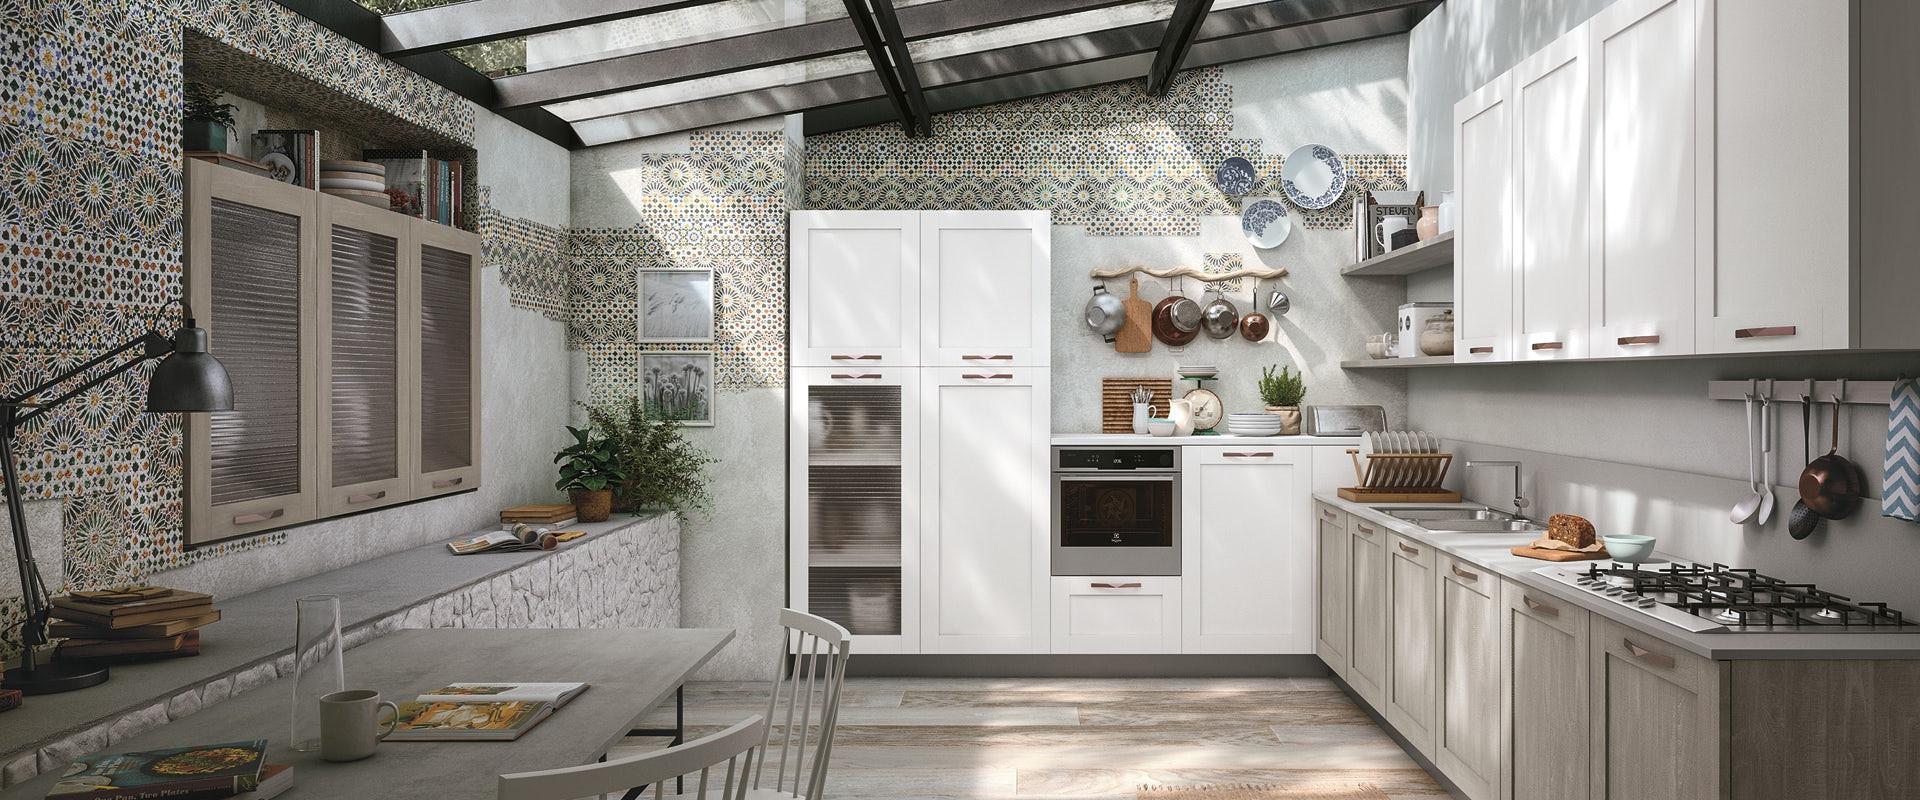 stosa-cucine-moderne-city-280.jpg